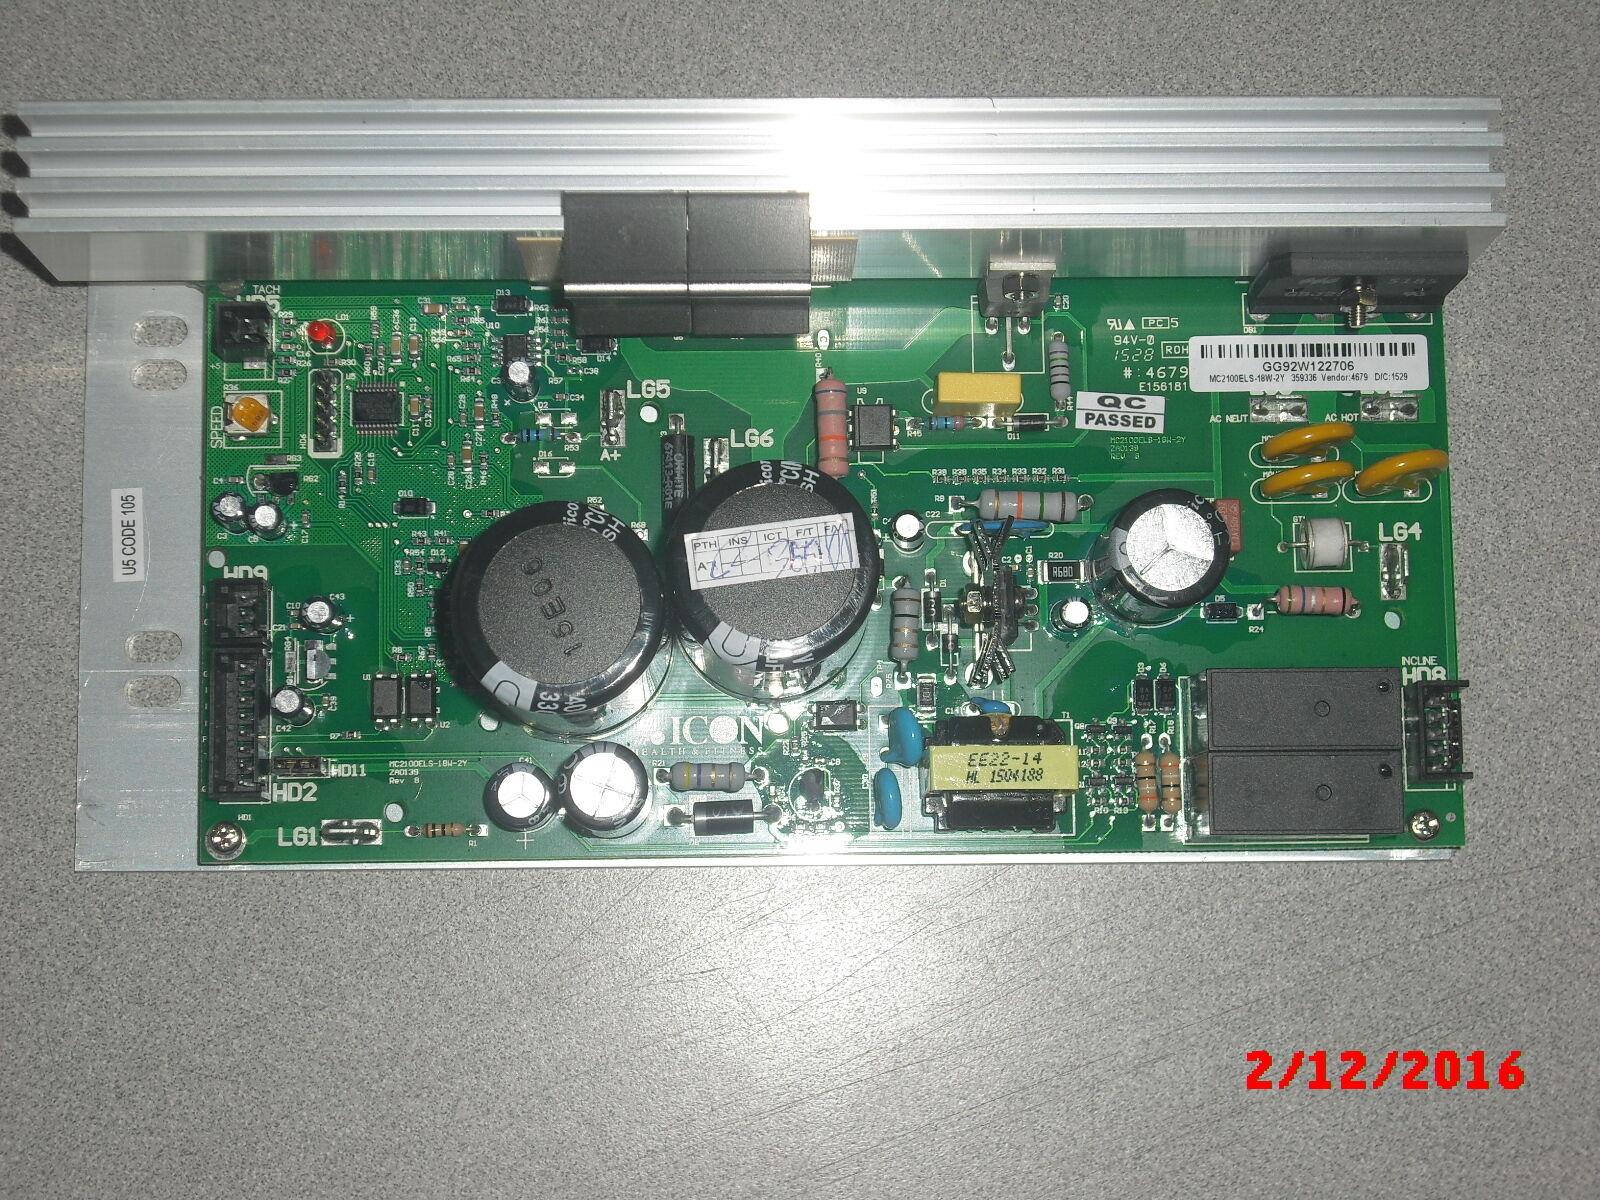 MC2100E MC2100 ELS MC2100 ELS 18w-2y Europe 220 vTreadmill Motor Motor Motor Control 359336 6154c3